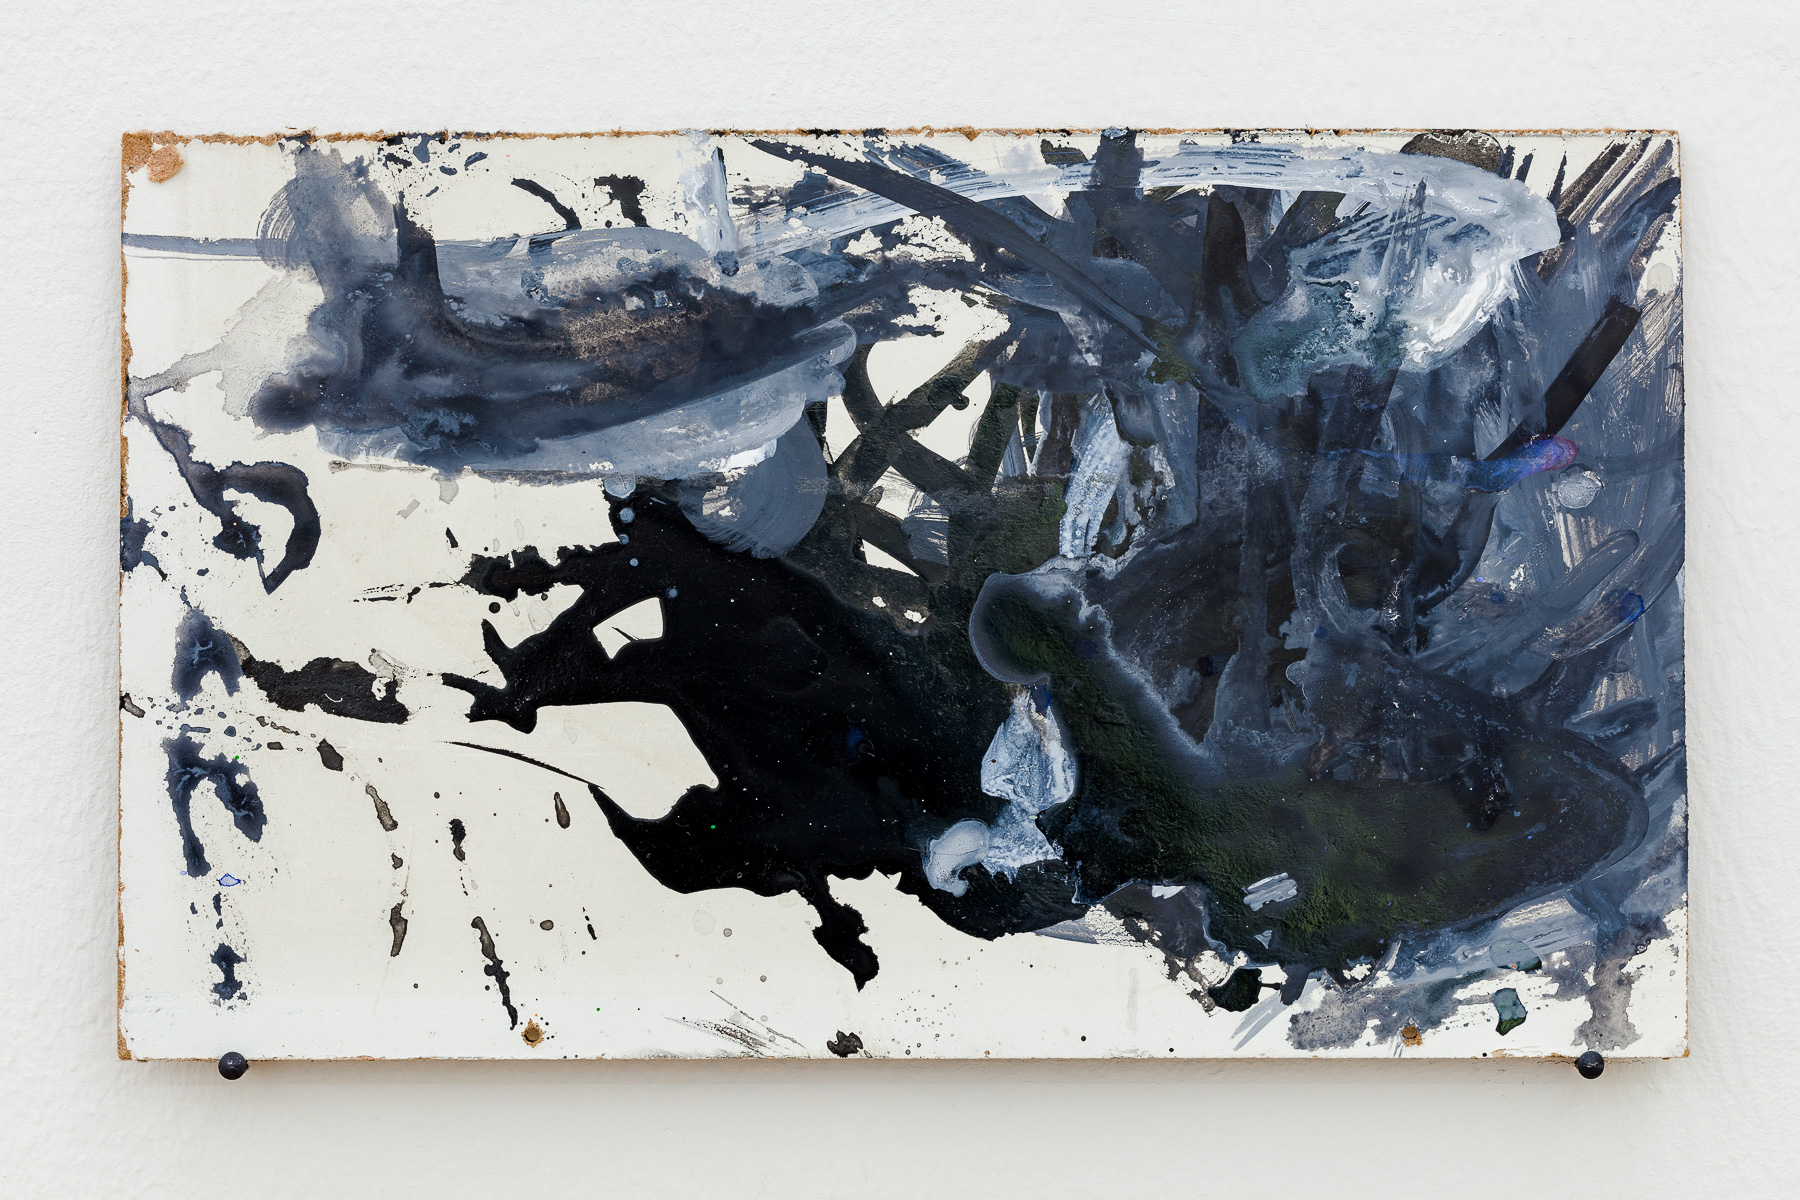 2019_05_20_Elke-Krystufek_Croy-Nielsen_by-kunst-dokumentation-com_007_web.jpg